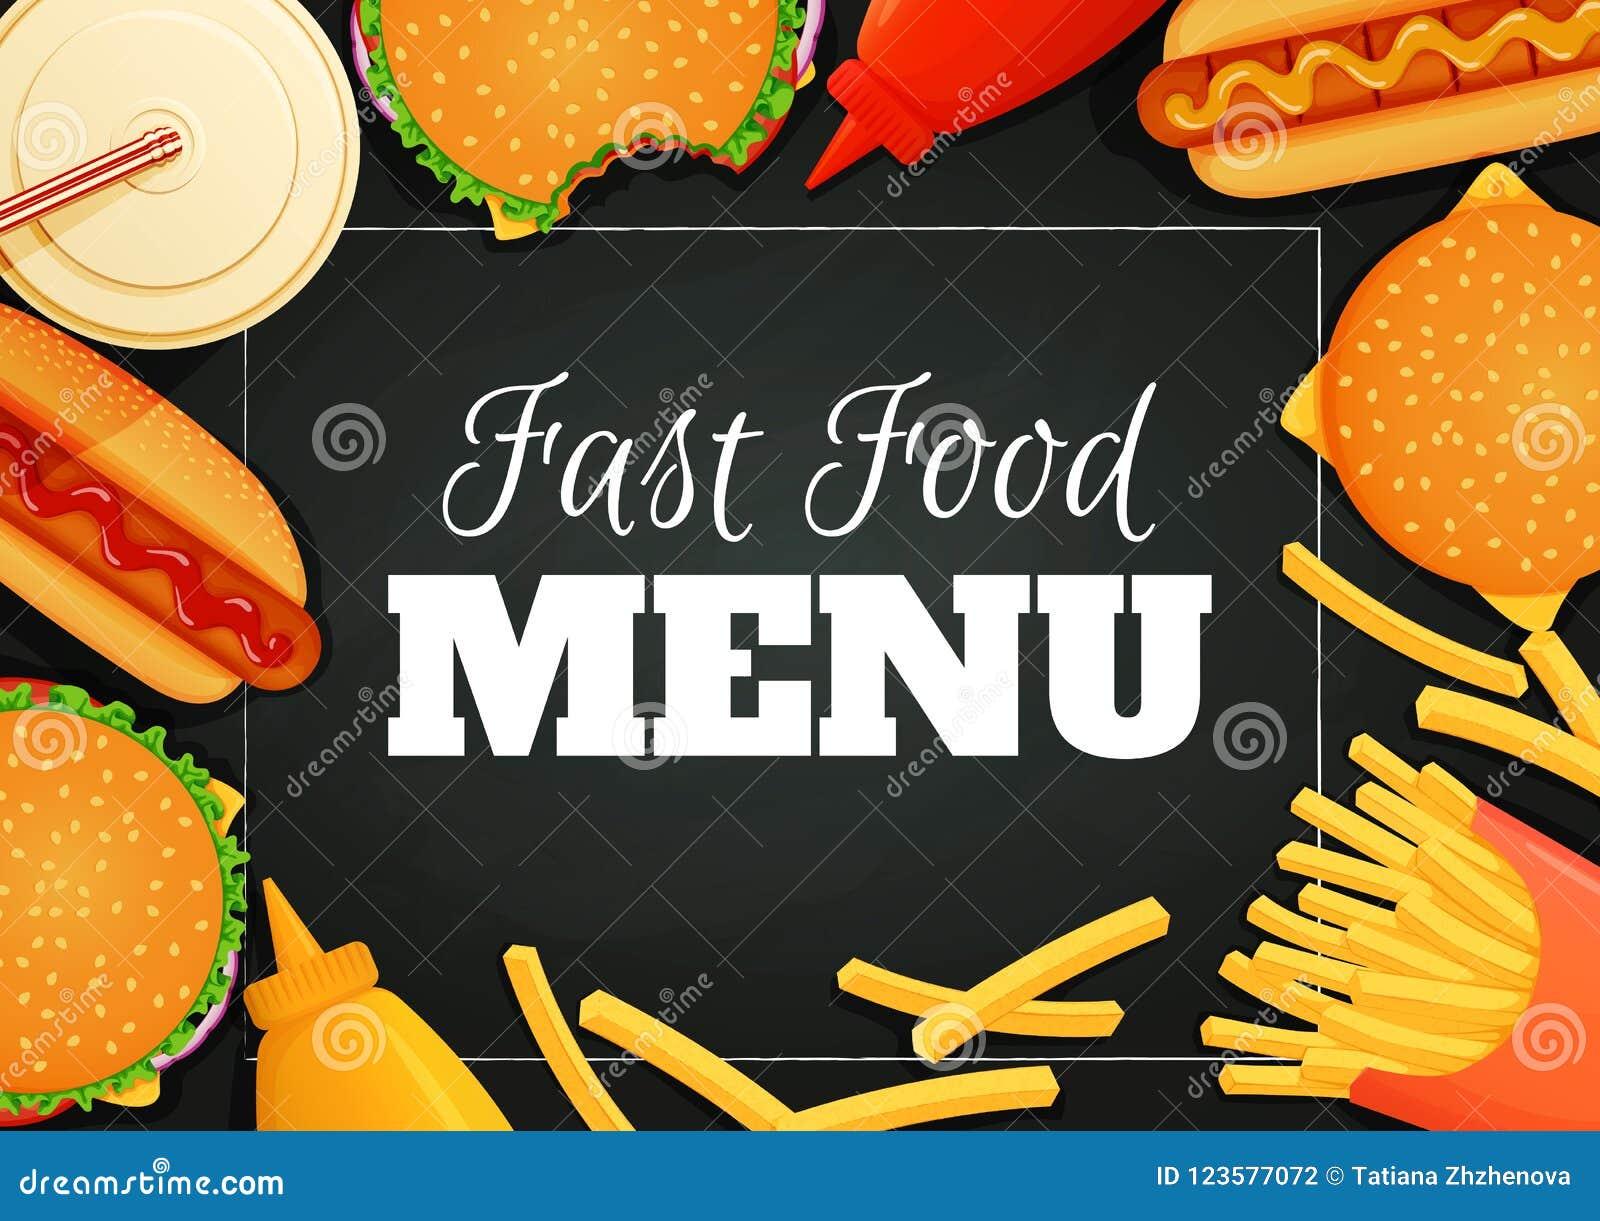 Fast Food Poster Banner Menu Template Burgers Hot Dogs Ketchup